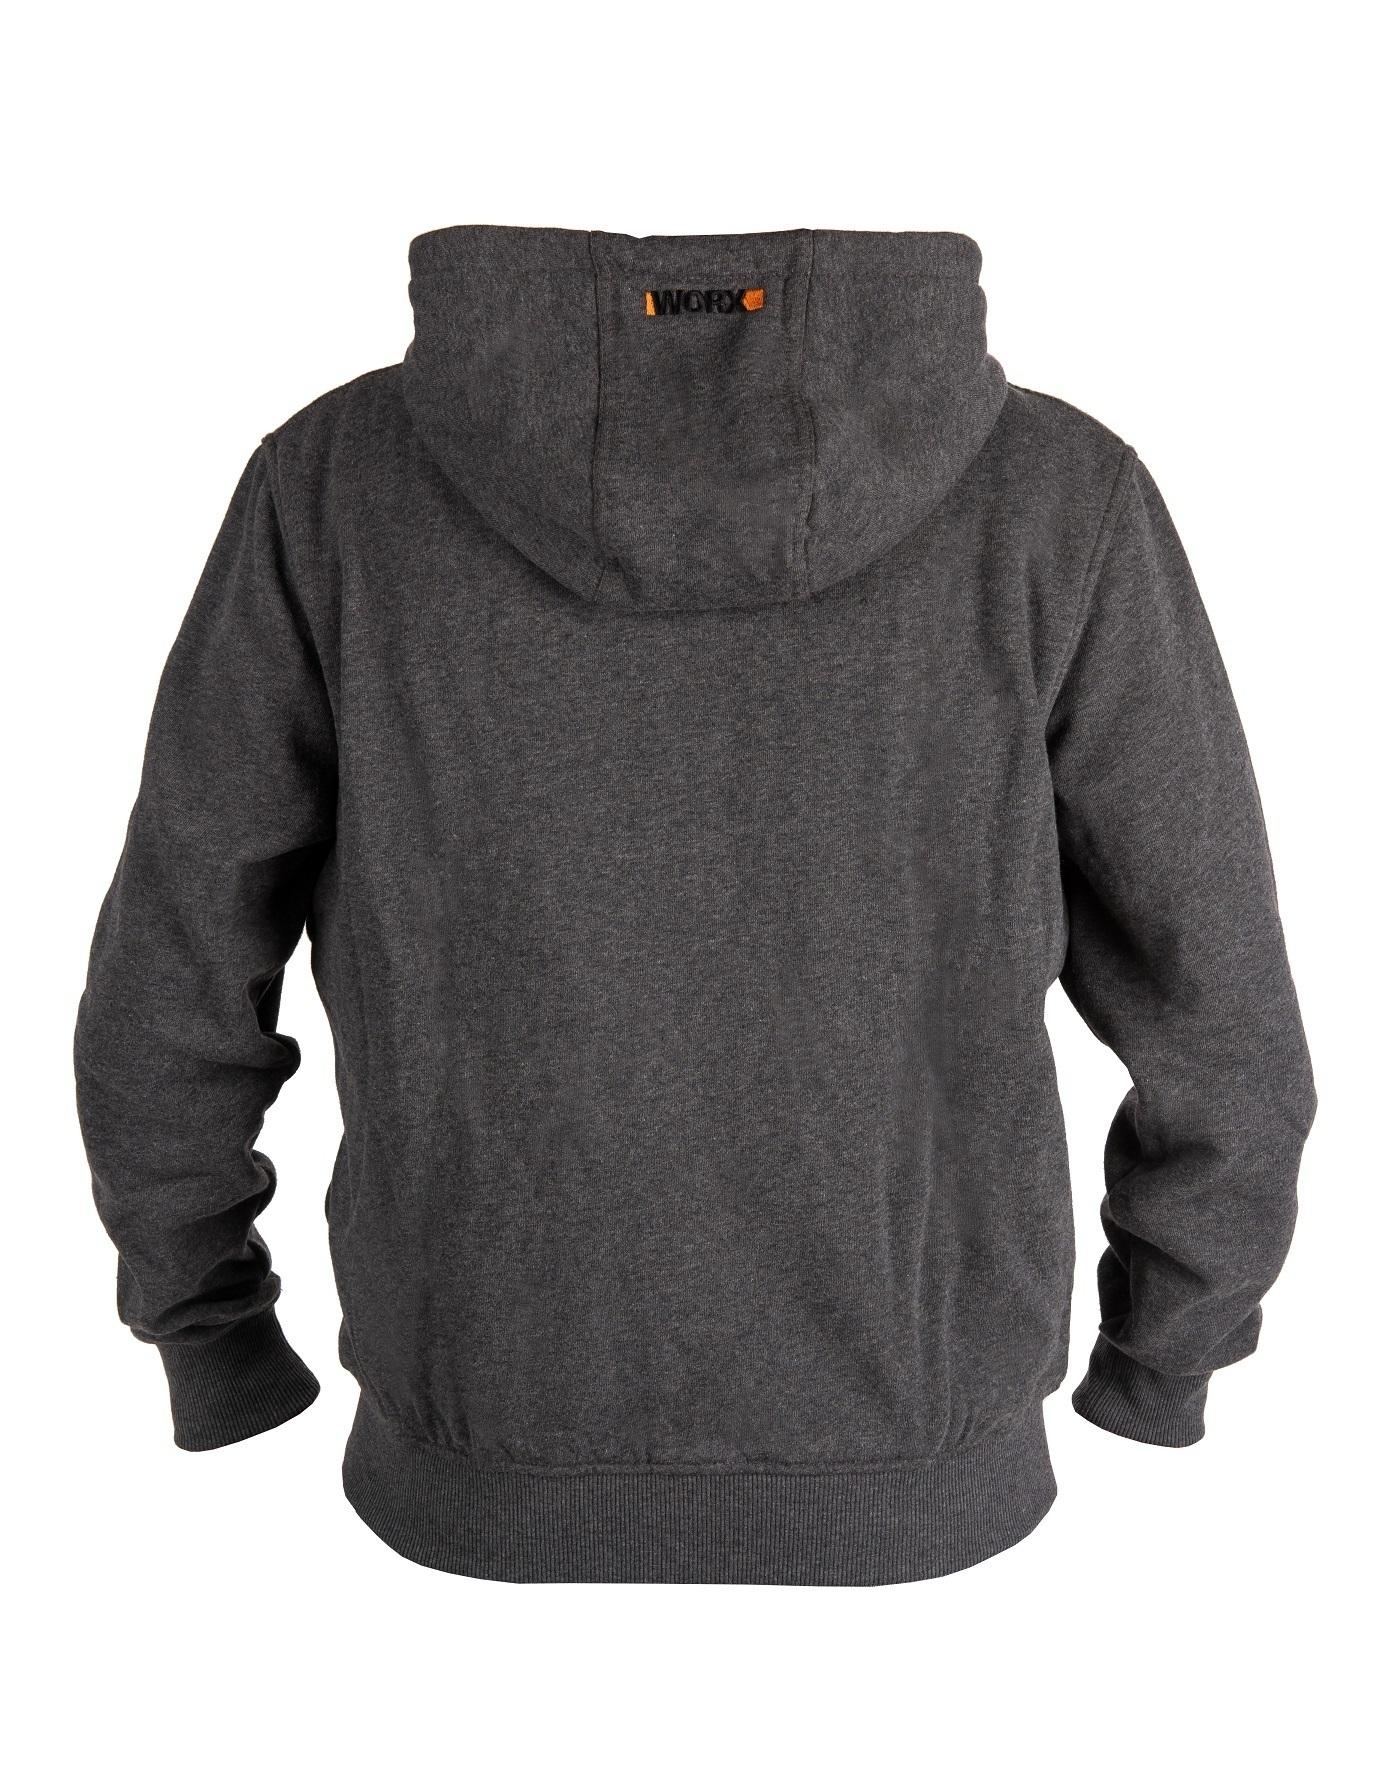 Куртка с подогревом Worx WA4660 L темно-серая